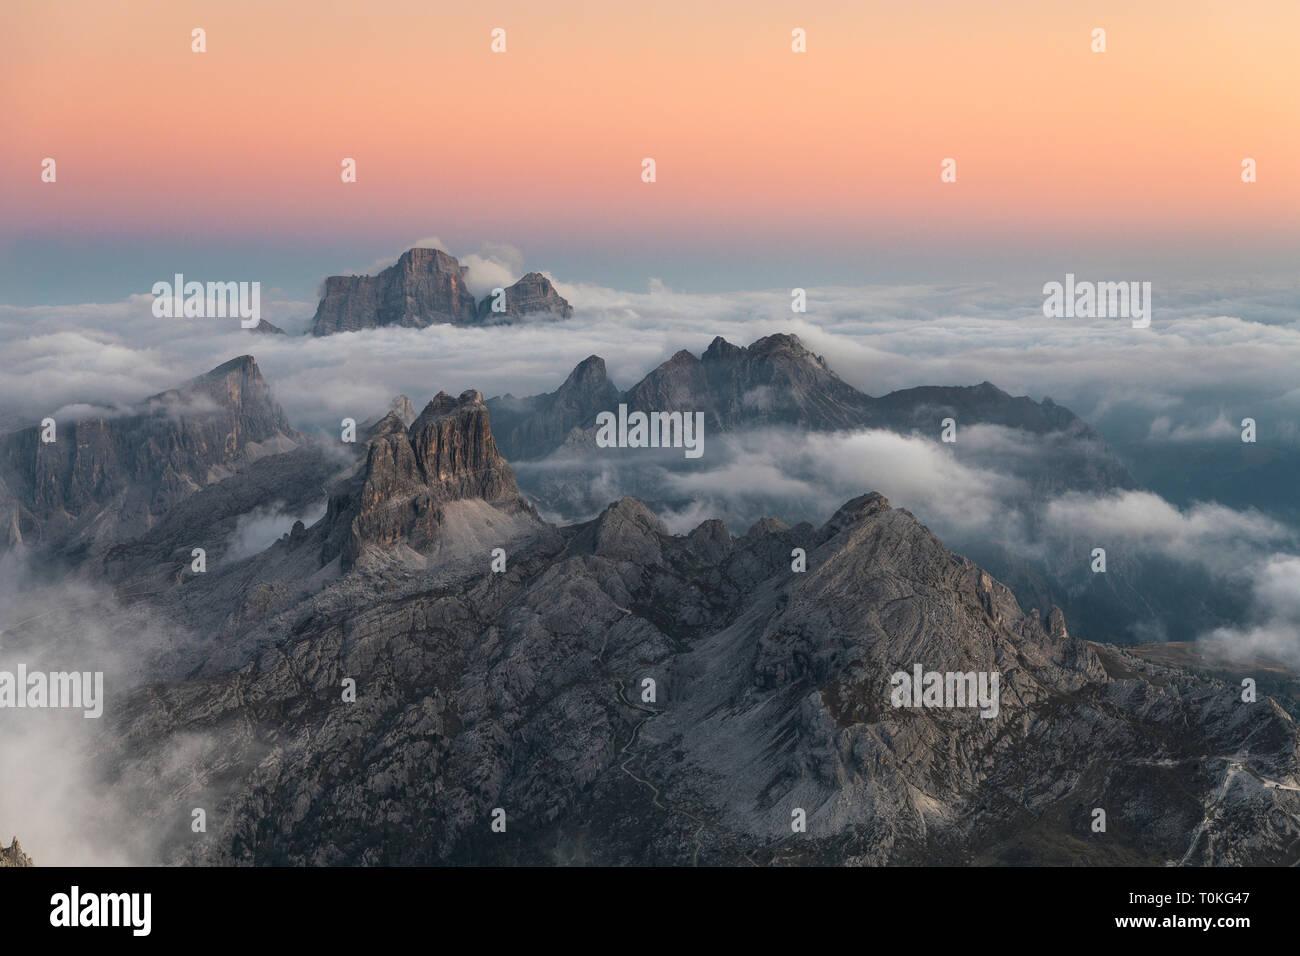 Vue depuis le Rifugio Lagazuoi (2752 m) à Monte Pelmo, Monte Averau et la Croda Negra et la Civetta, Dolomites, Cortina d'Ampezzo, Italie Banque D'Images